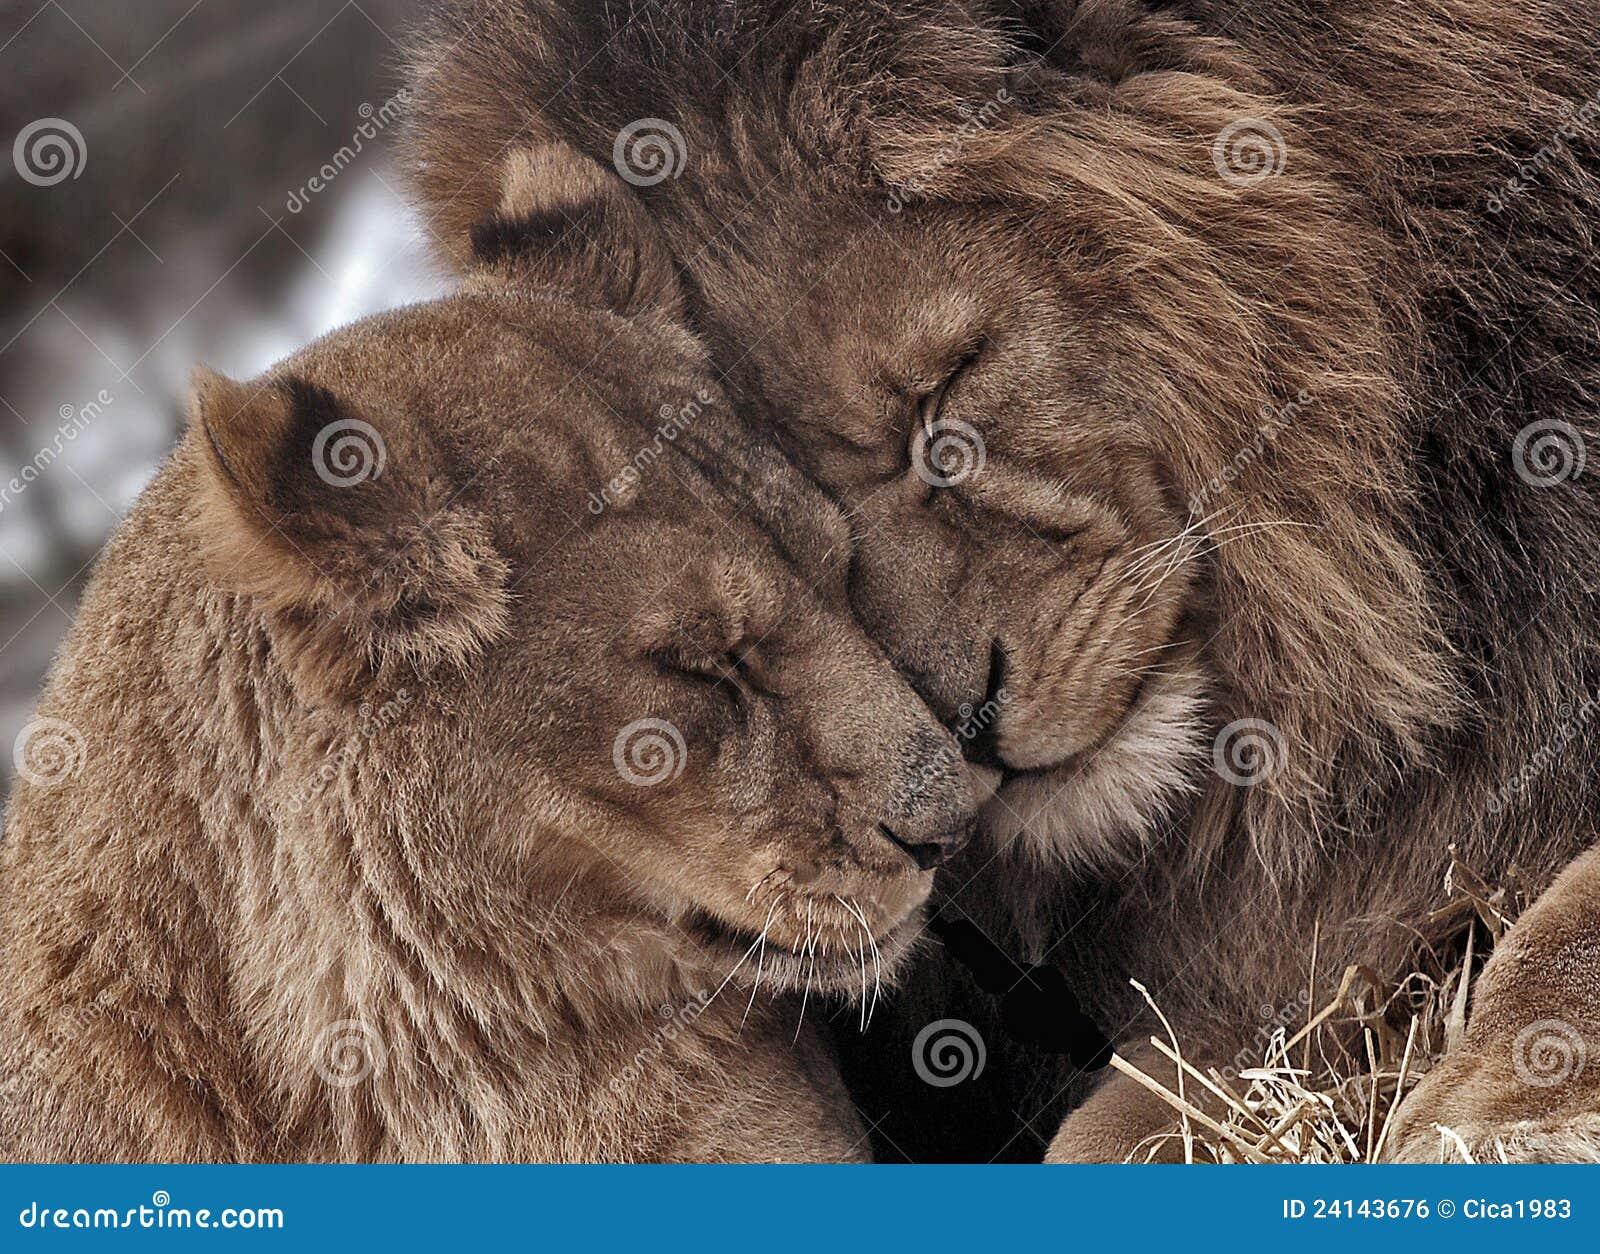 lion couple stock photo. image of together, predator - 24143676